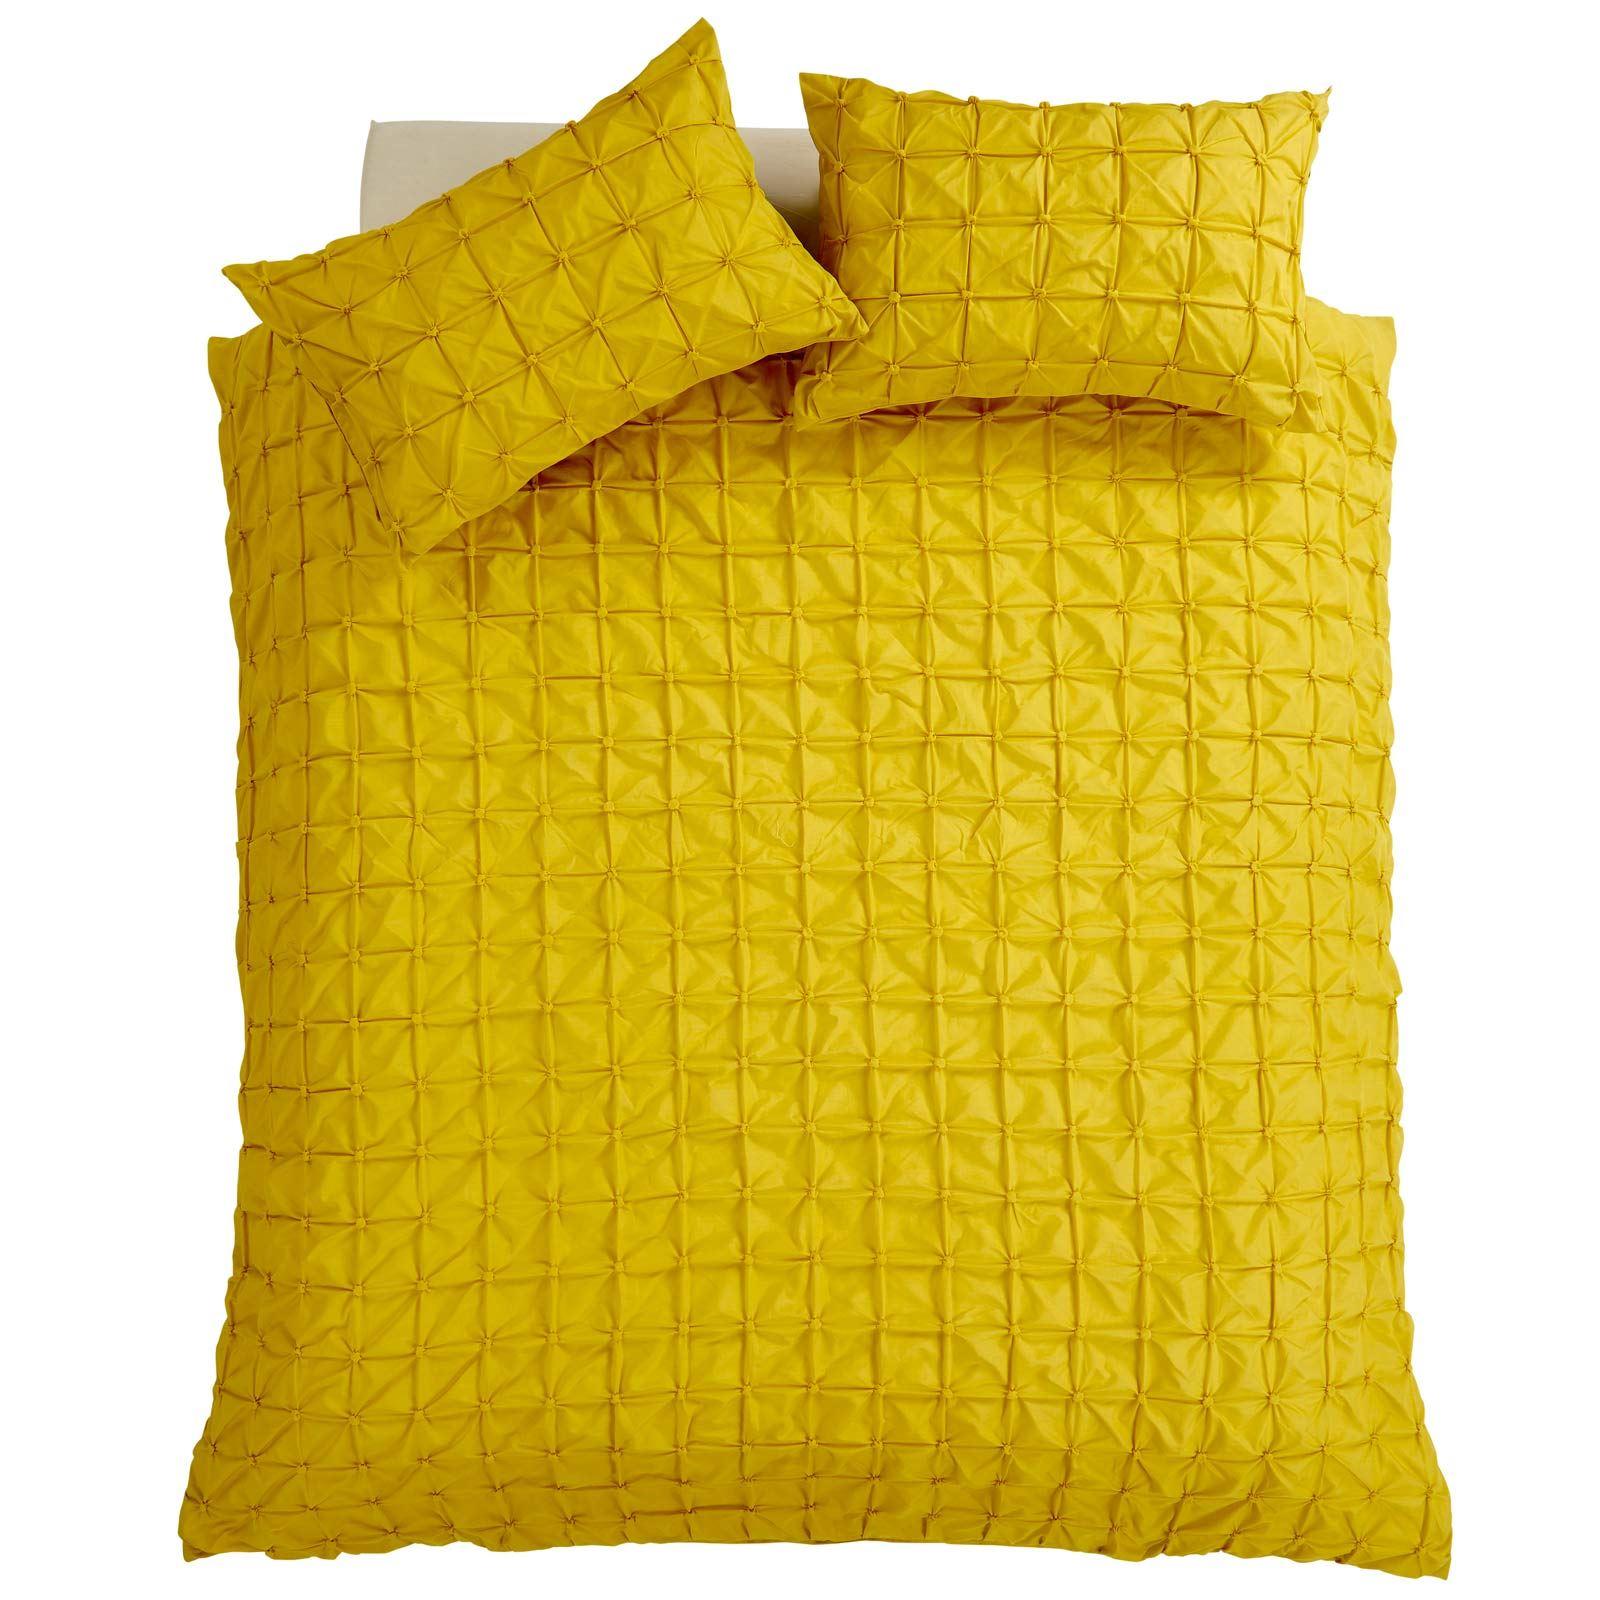 Pleated-Duvet-Covers-Seville-Pintuck-Luxury-Cotton-Rich-Quilt-Bedding-Sets thumbnail 9